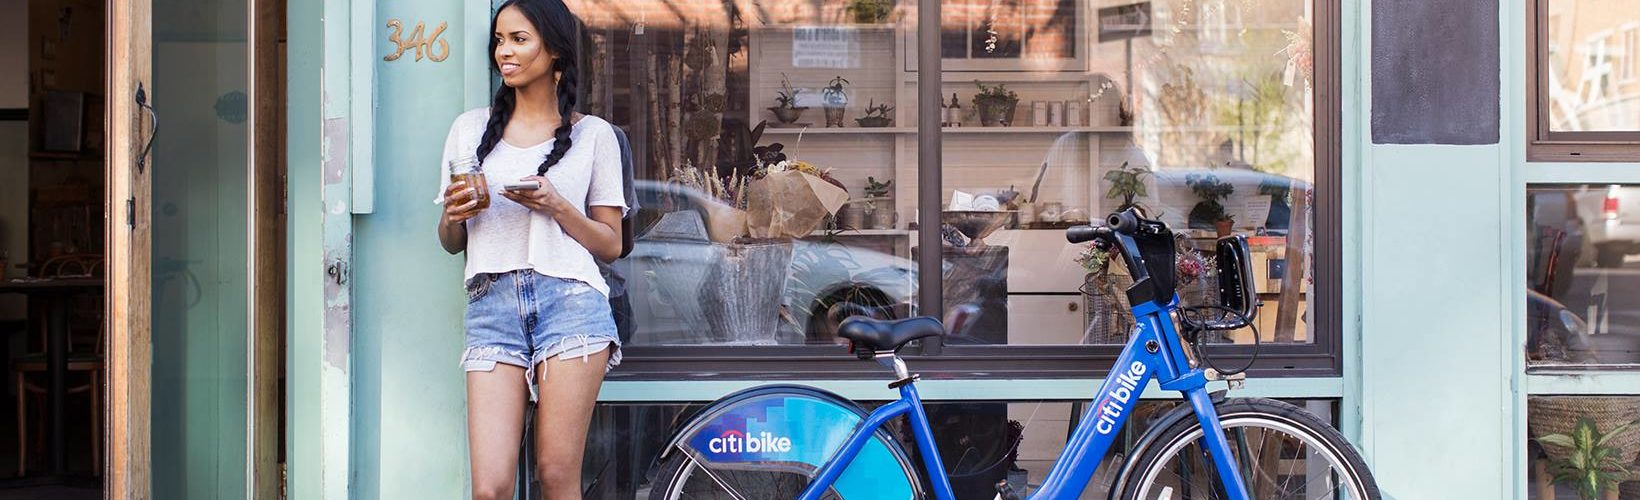 city-bike-velos-ville-transport-nyc-une2